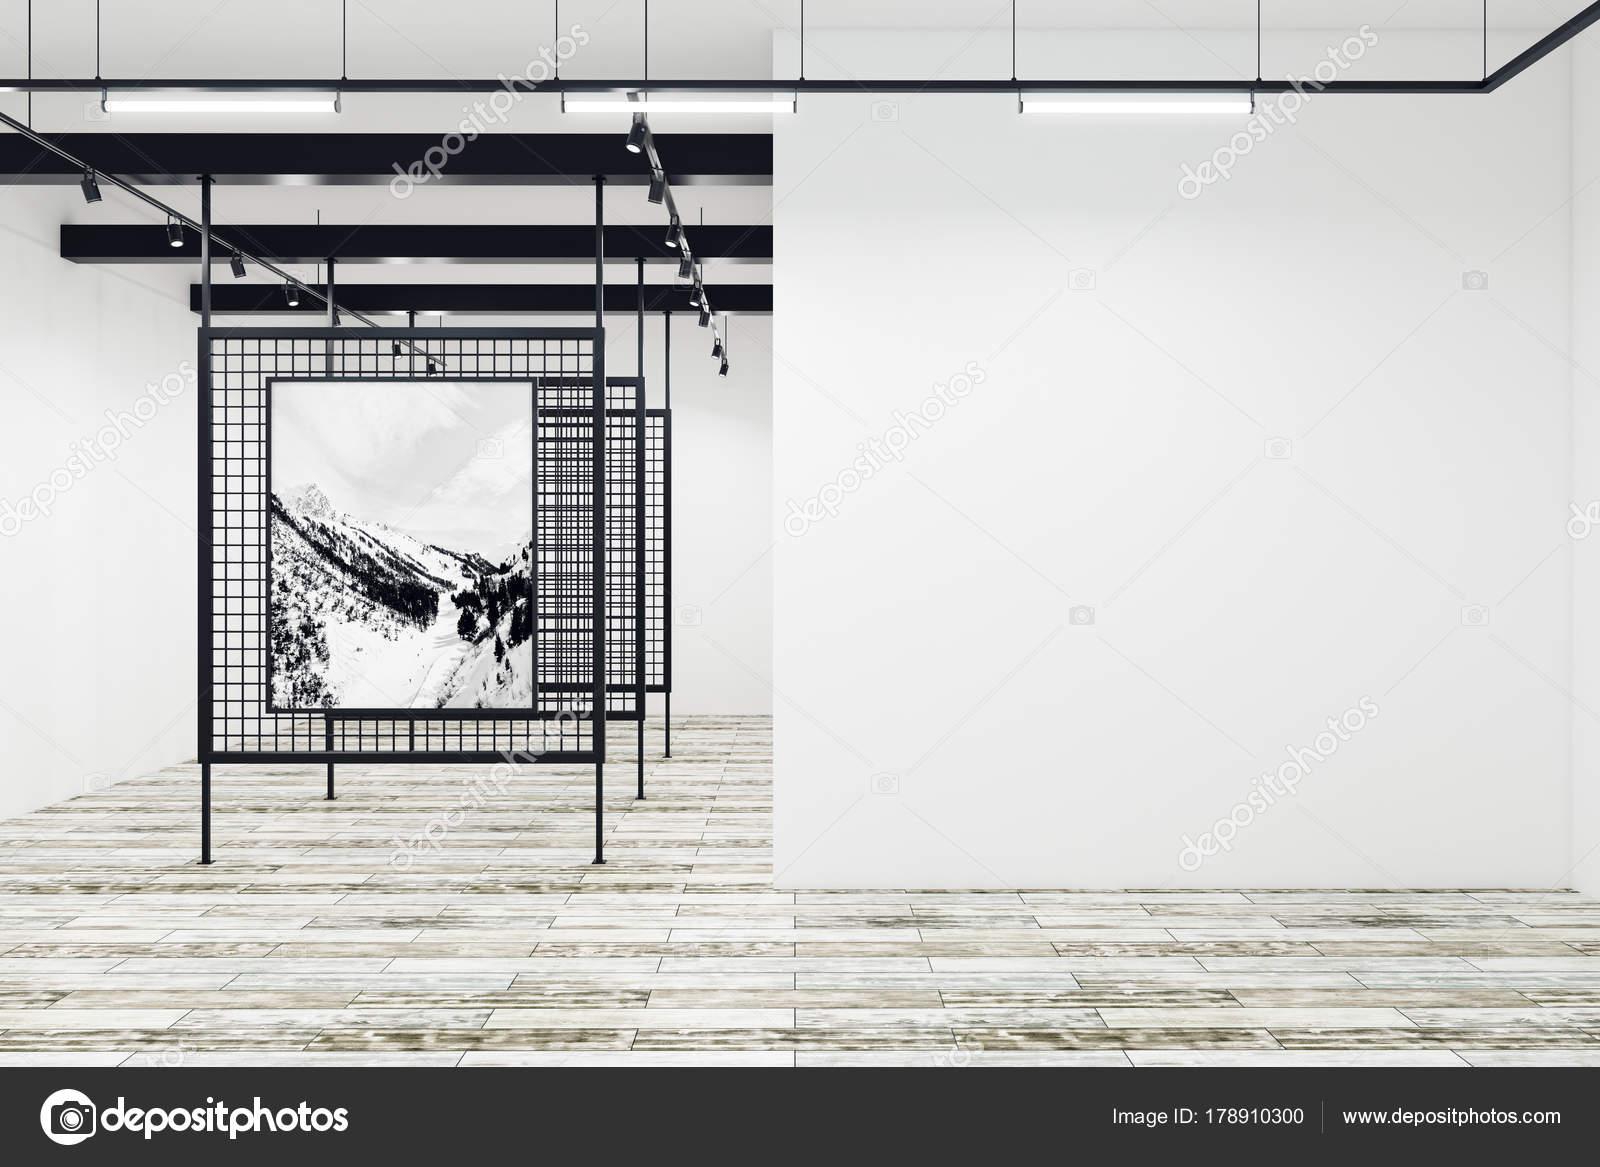 Moderne Galerie mit leeren Plakatwand — Stockfoto © peshkova #178910300